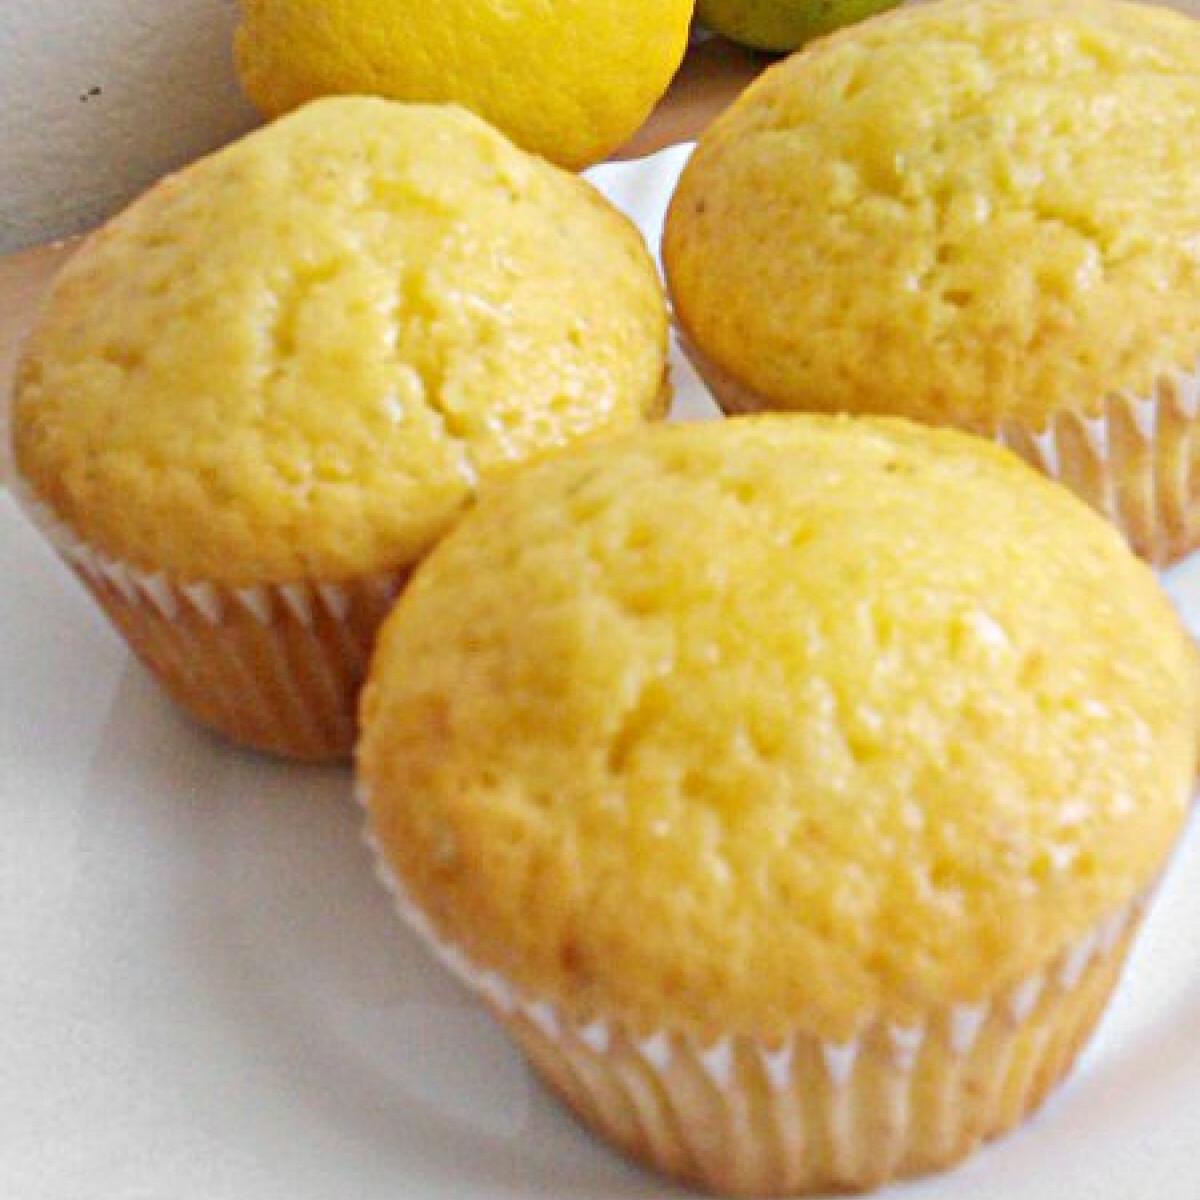 Ezen a képen: Lime szirupos muffin